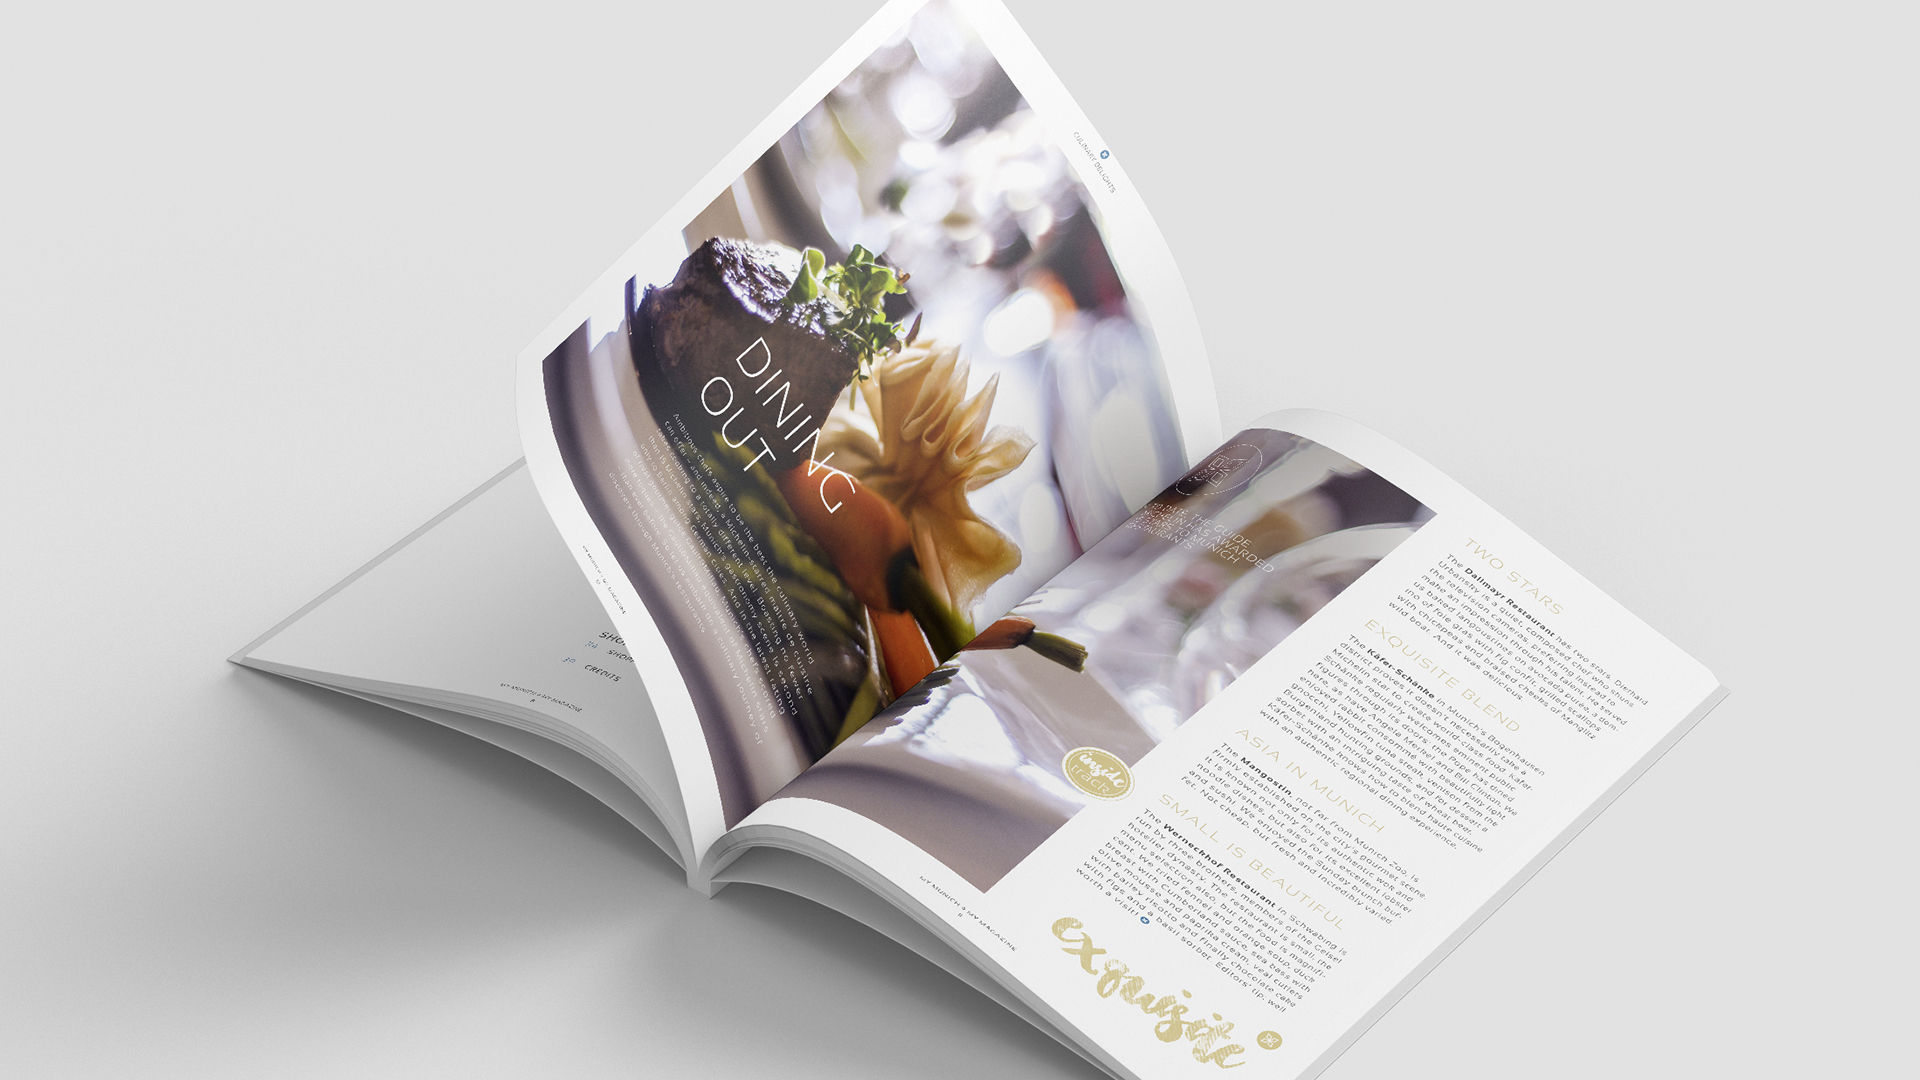 Saleskit Océ Canon Magazin Inhalt